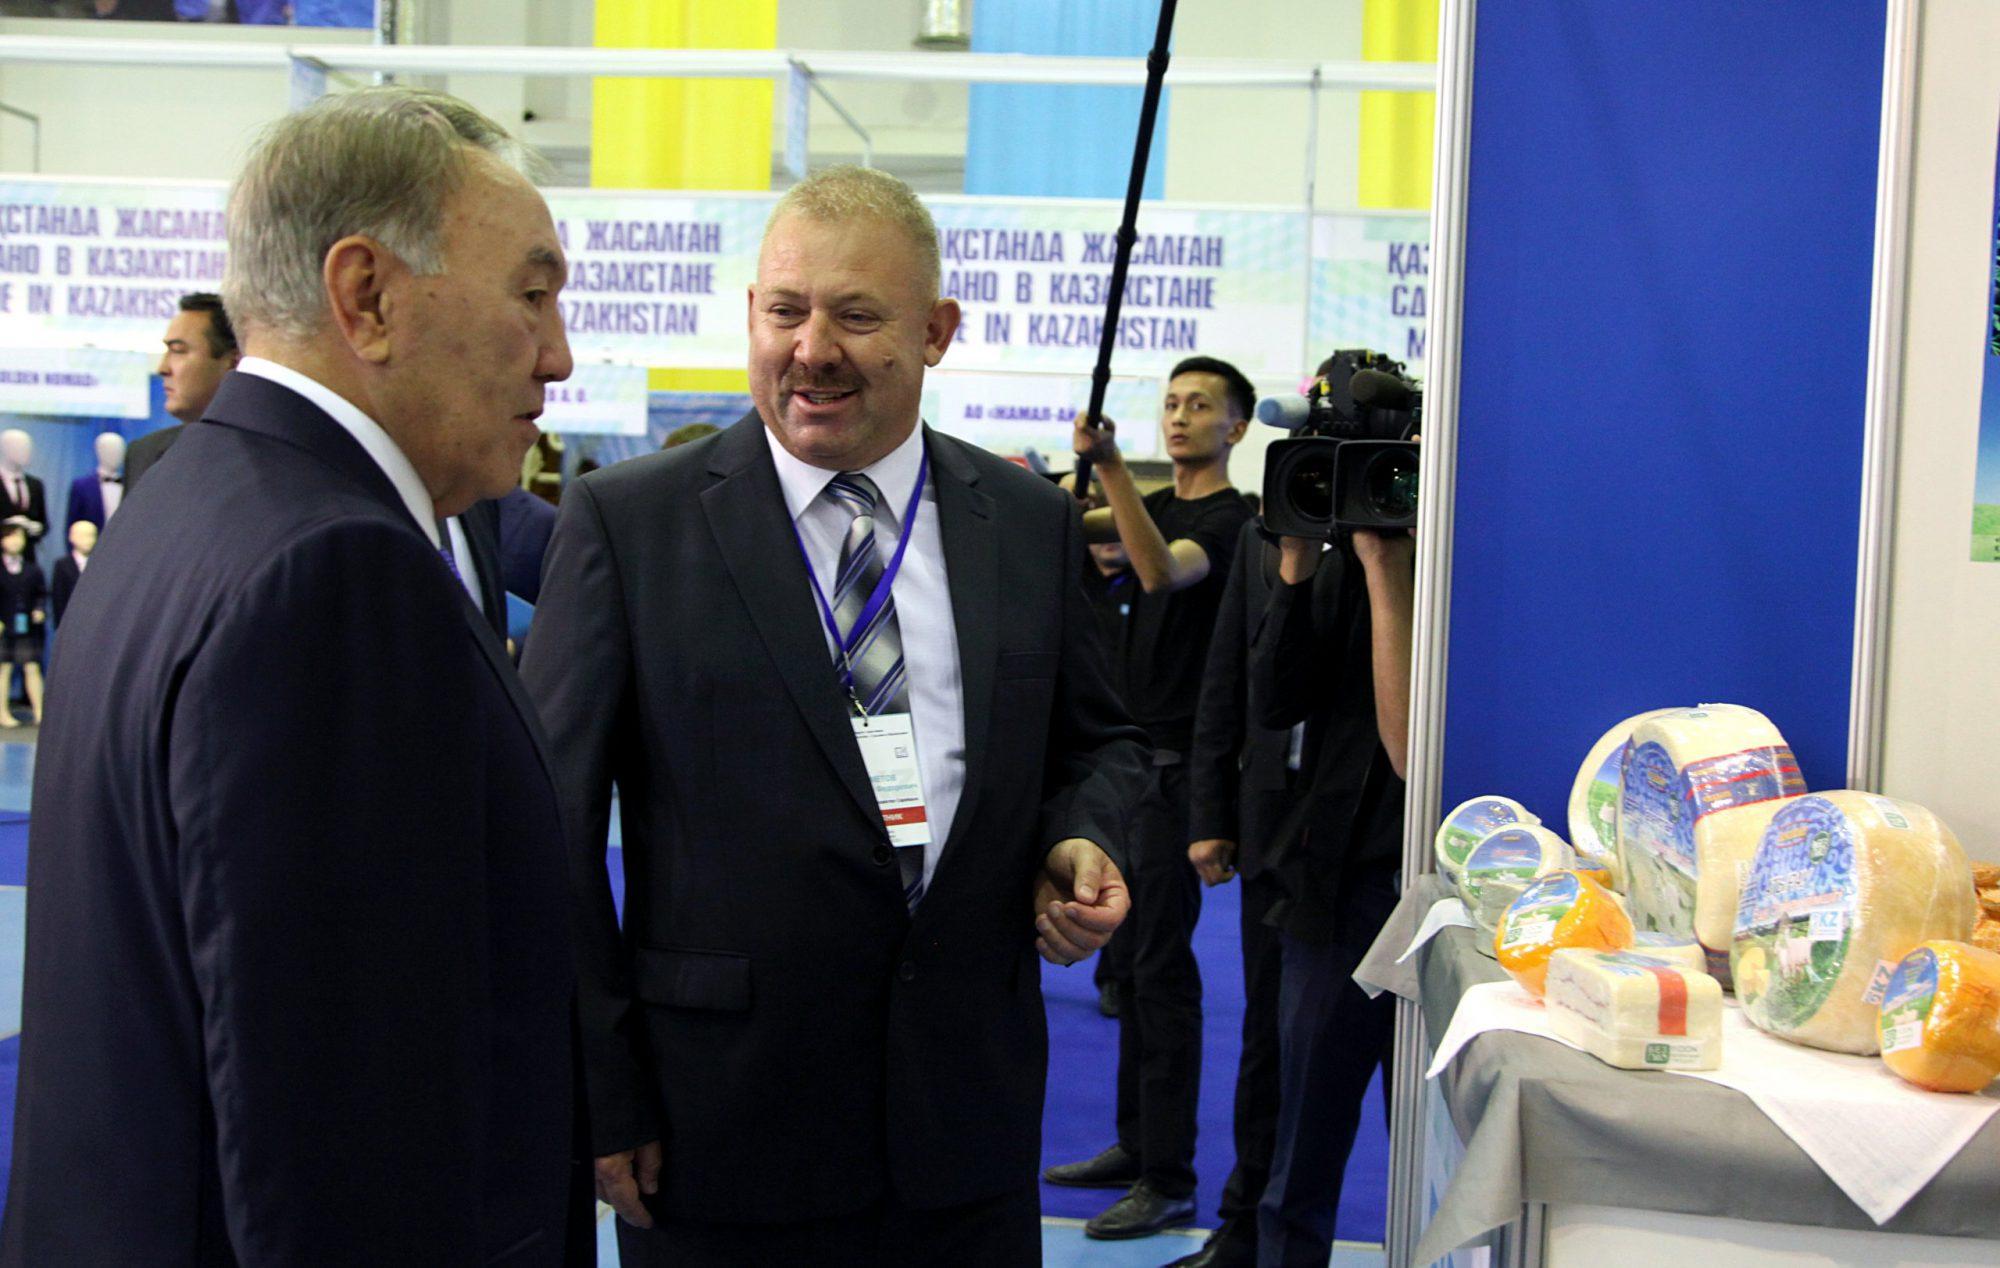 Сарайшық сүт ірімшік зауыты Назарбаев